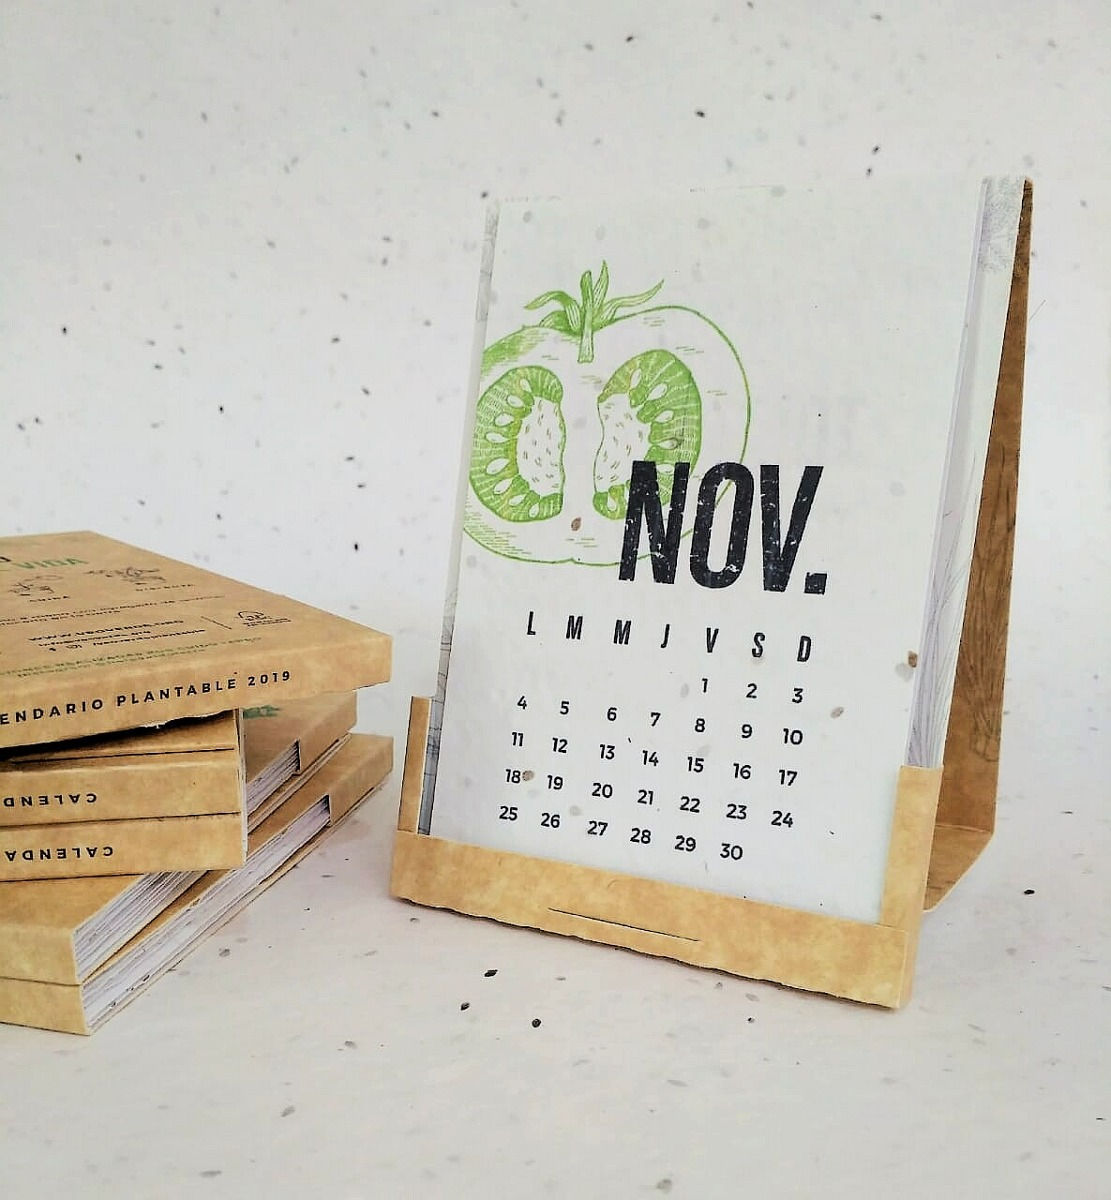 Combo 5 - Calendario Plantable 2019 - Papel Reciclado Con...